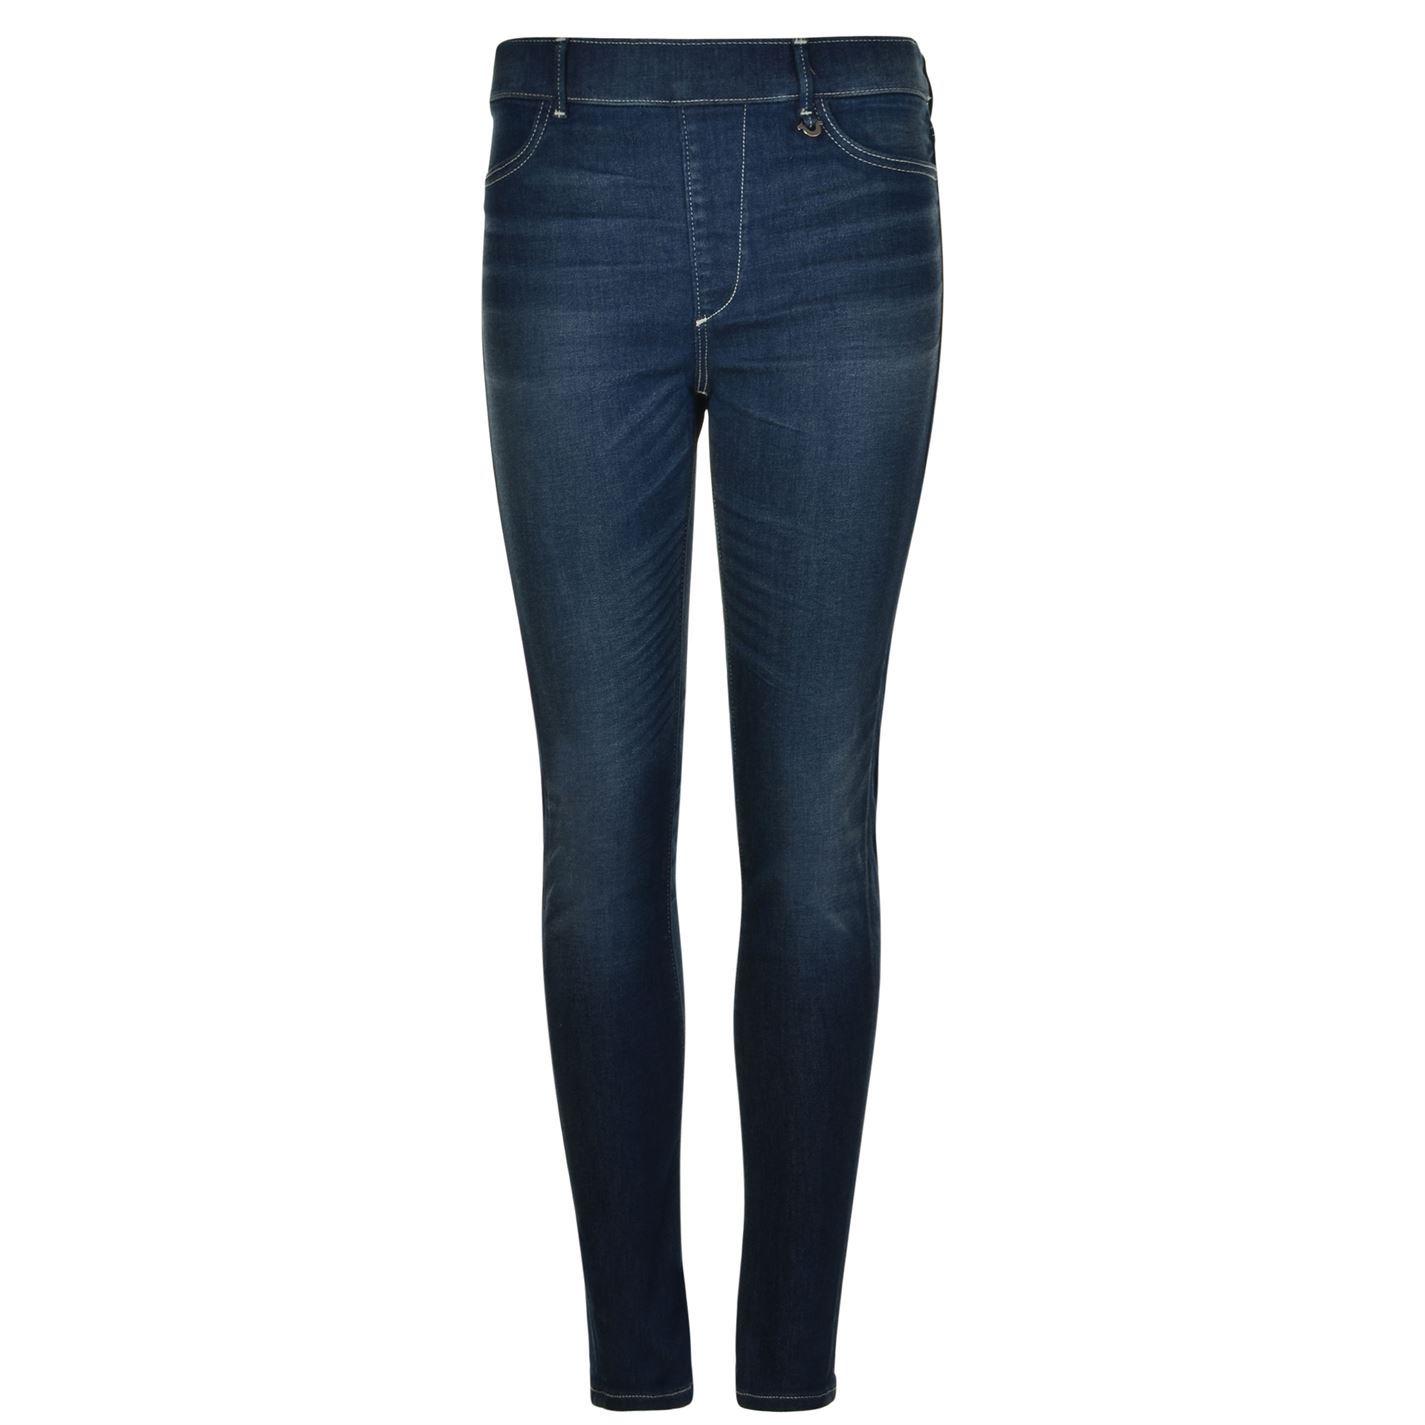 371d095921dbd Womens TRUE RELIGION Runway Legging Jeans Slim Skinny Fit New | eBay